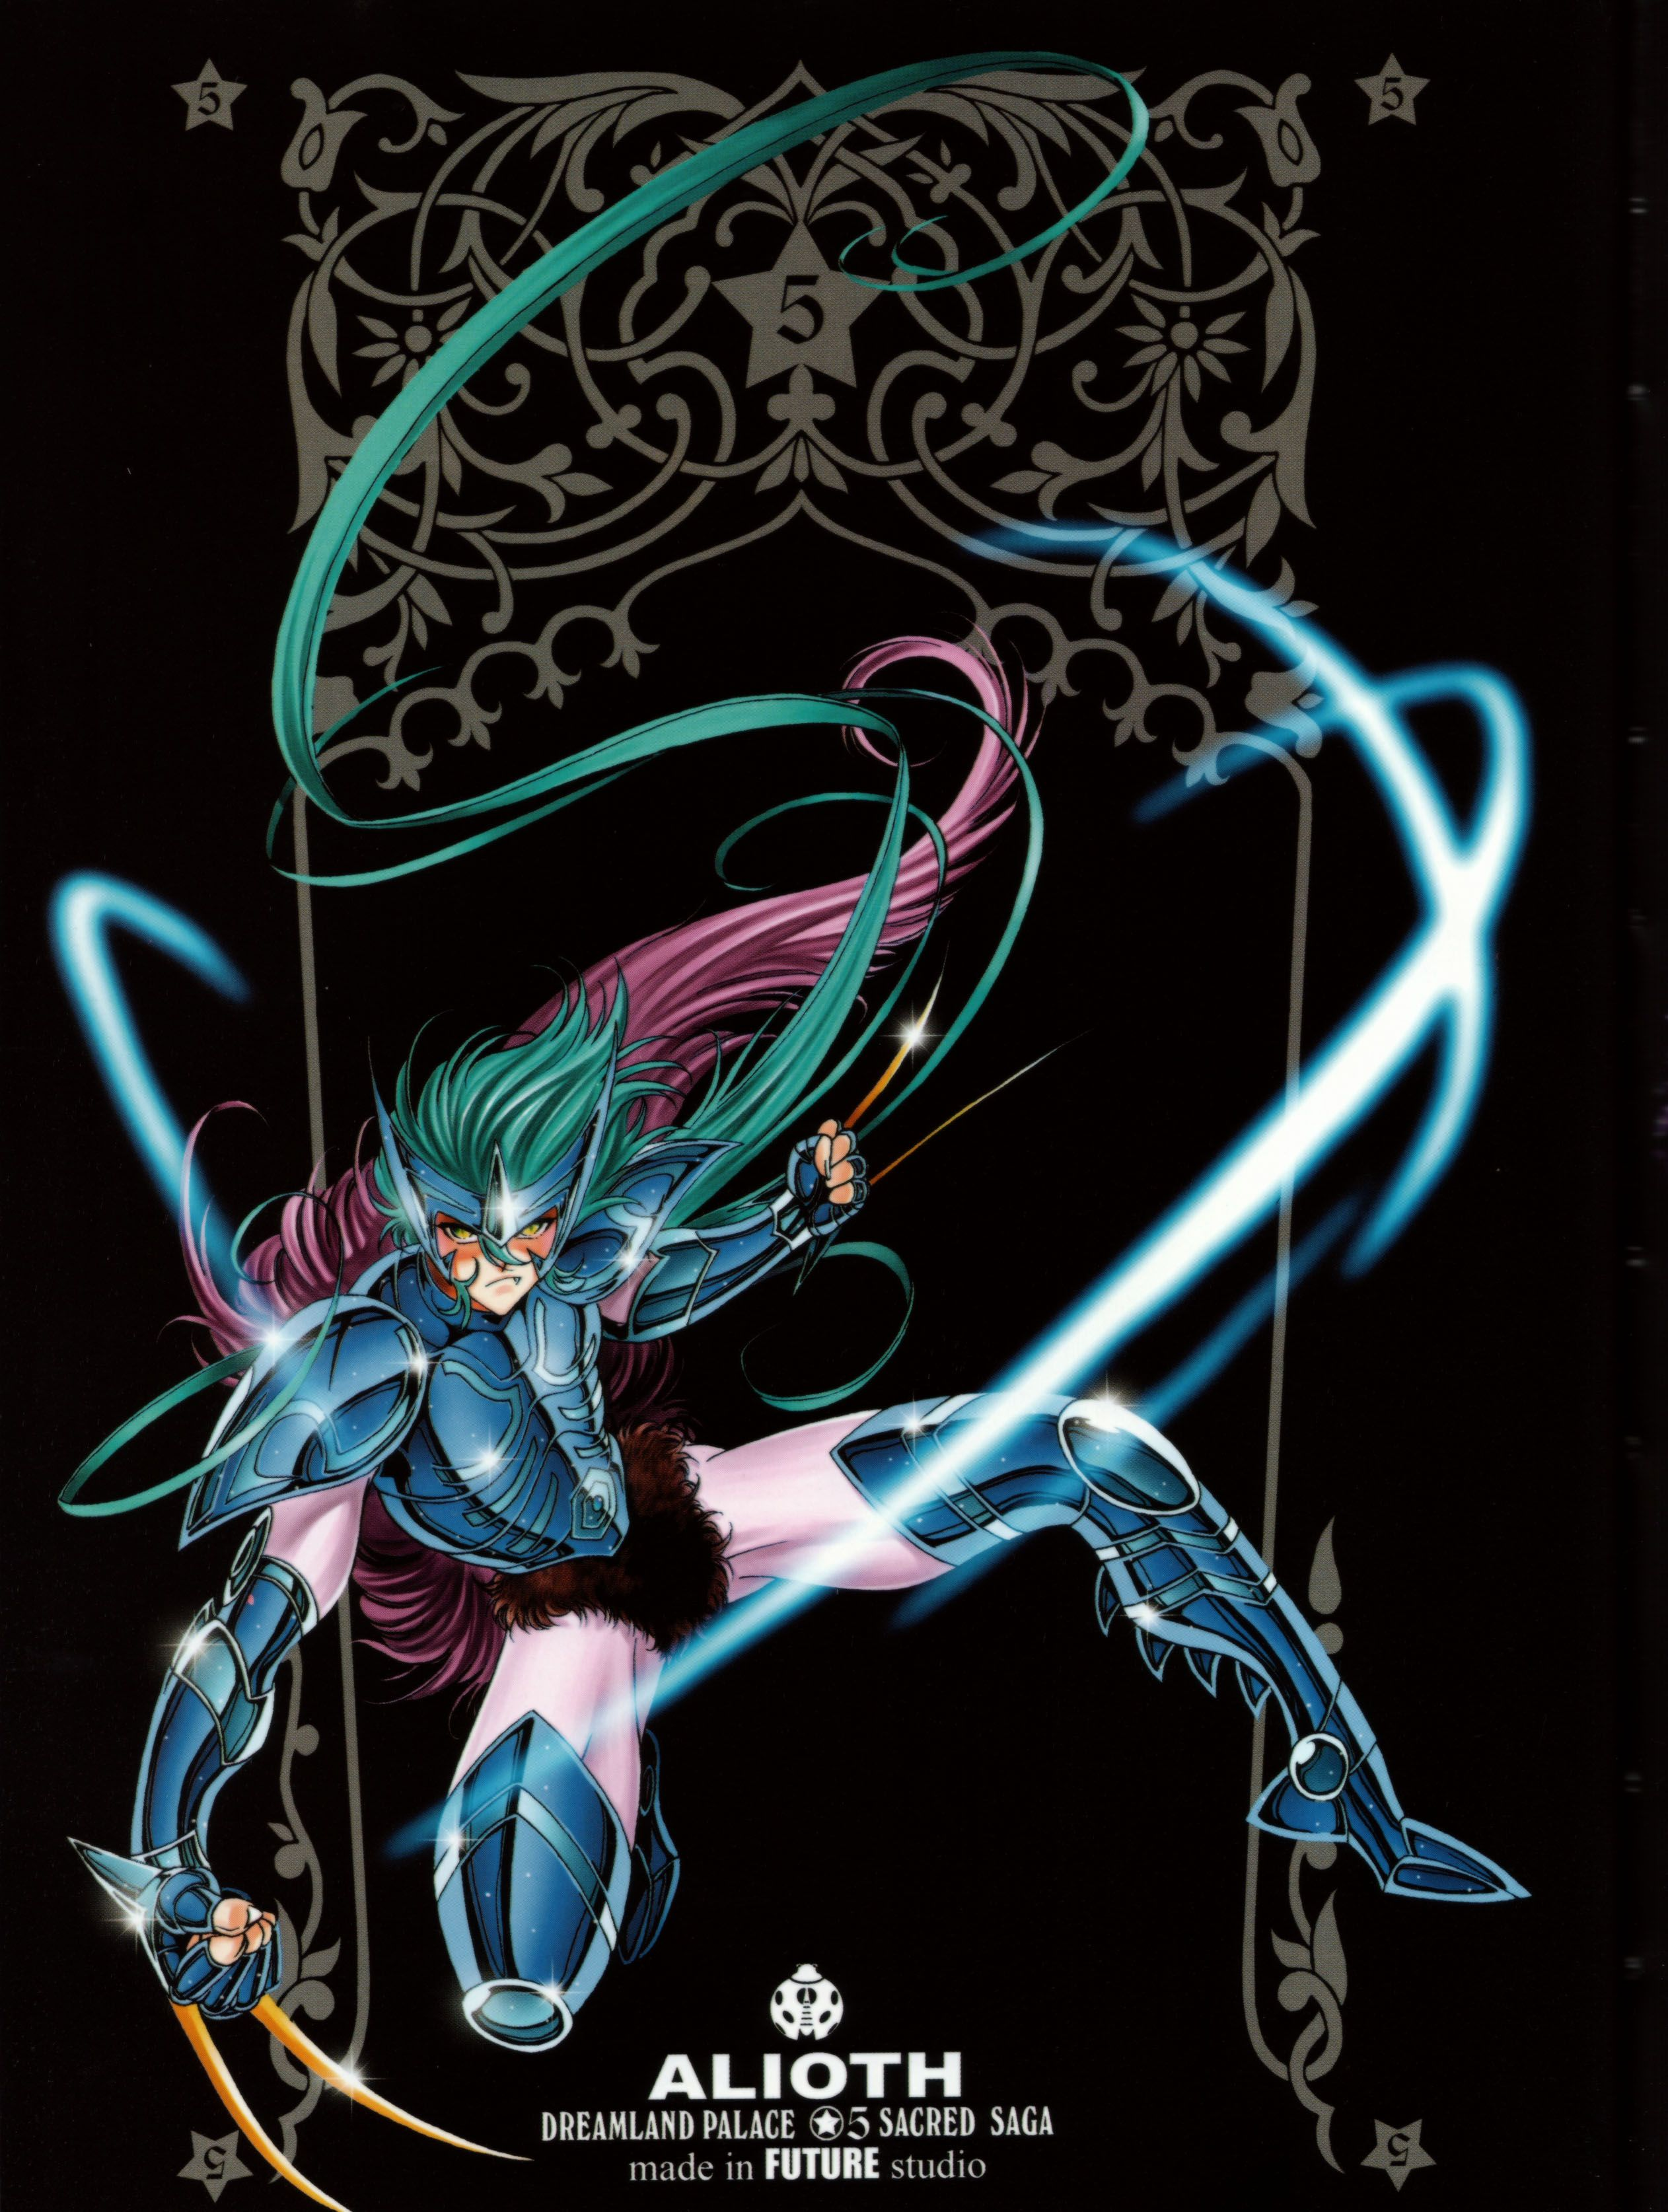 Males Saint Seiya Masami Kurumada Future Studio Saint Seiya Future Studio God Warrior Alioth Epsilon Fenrir